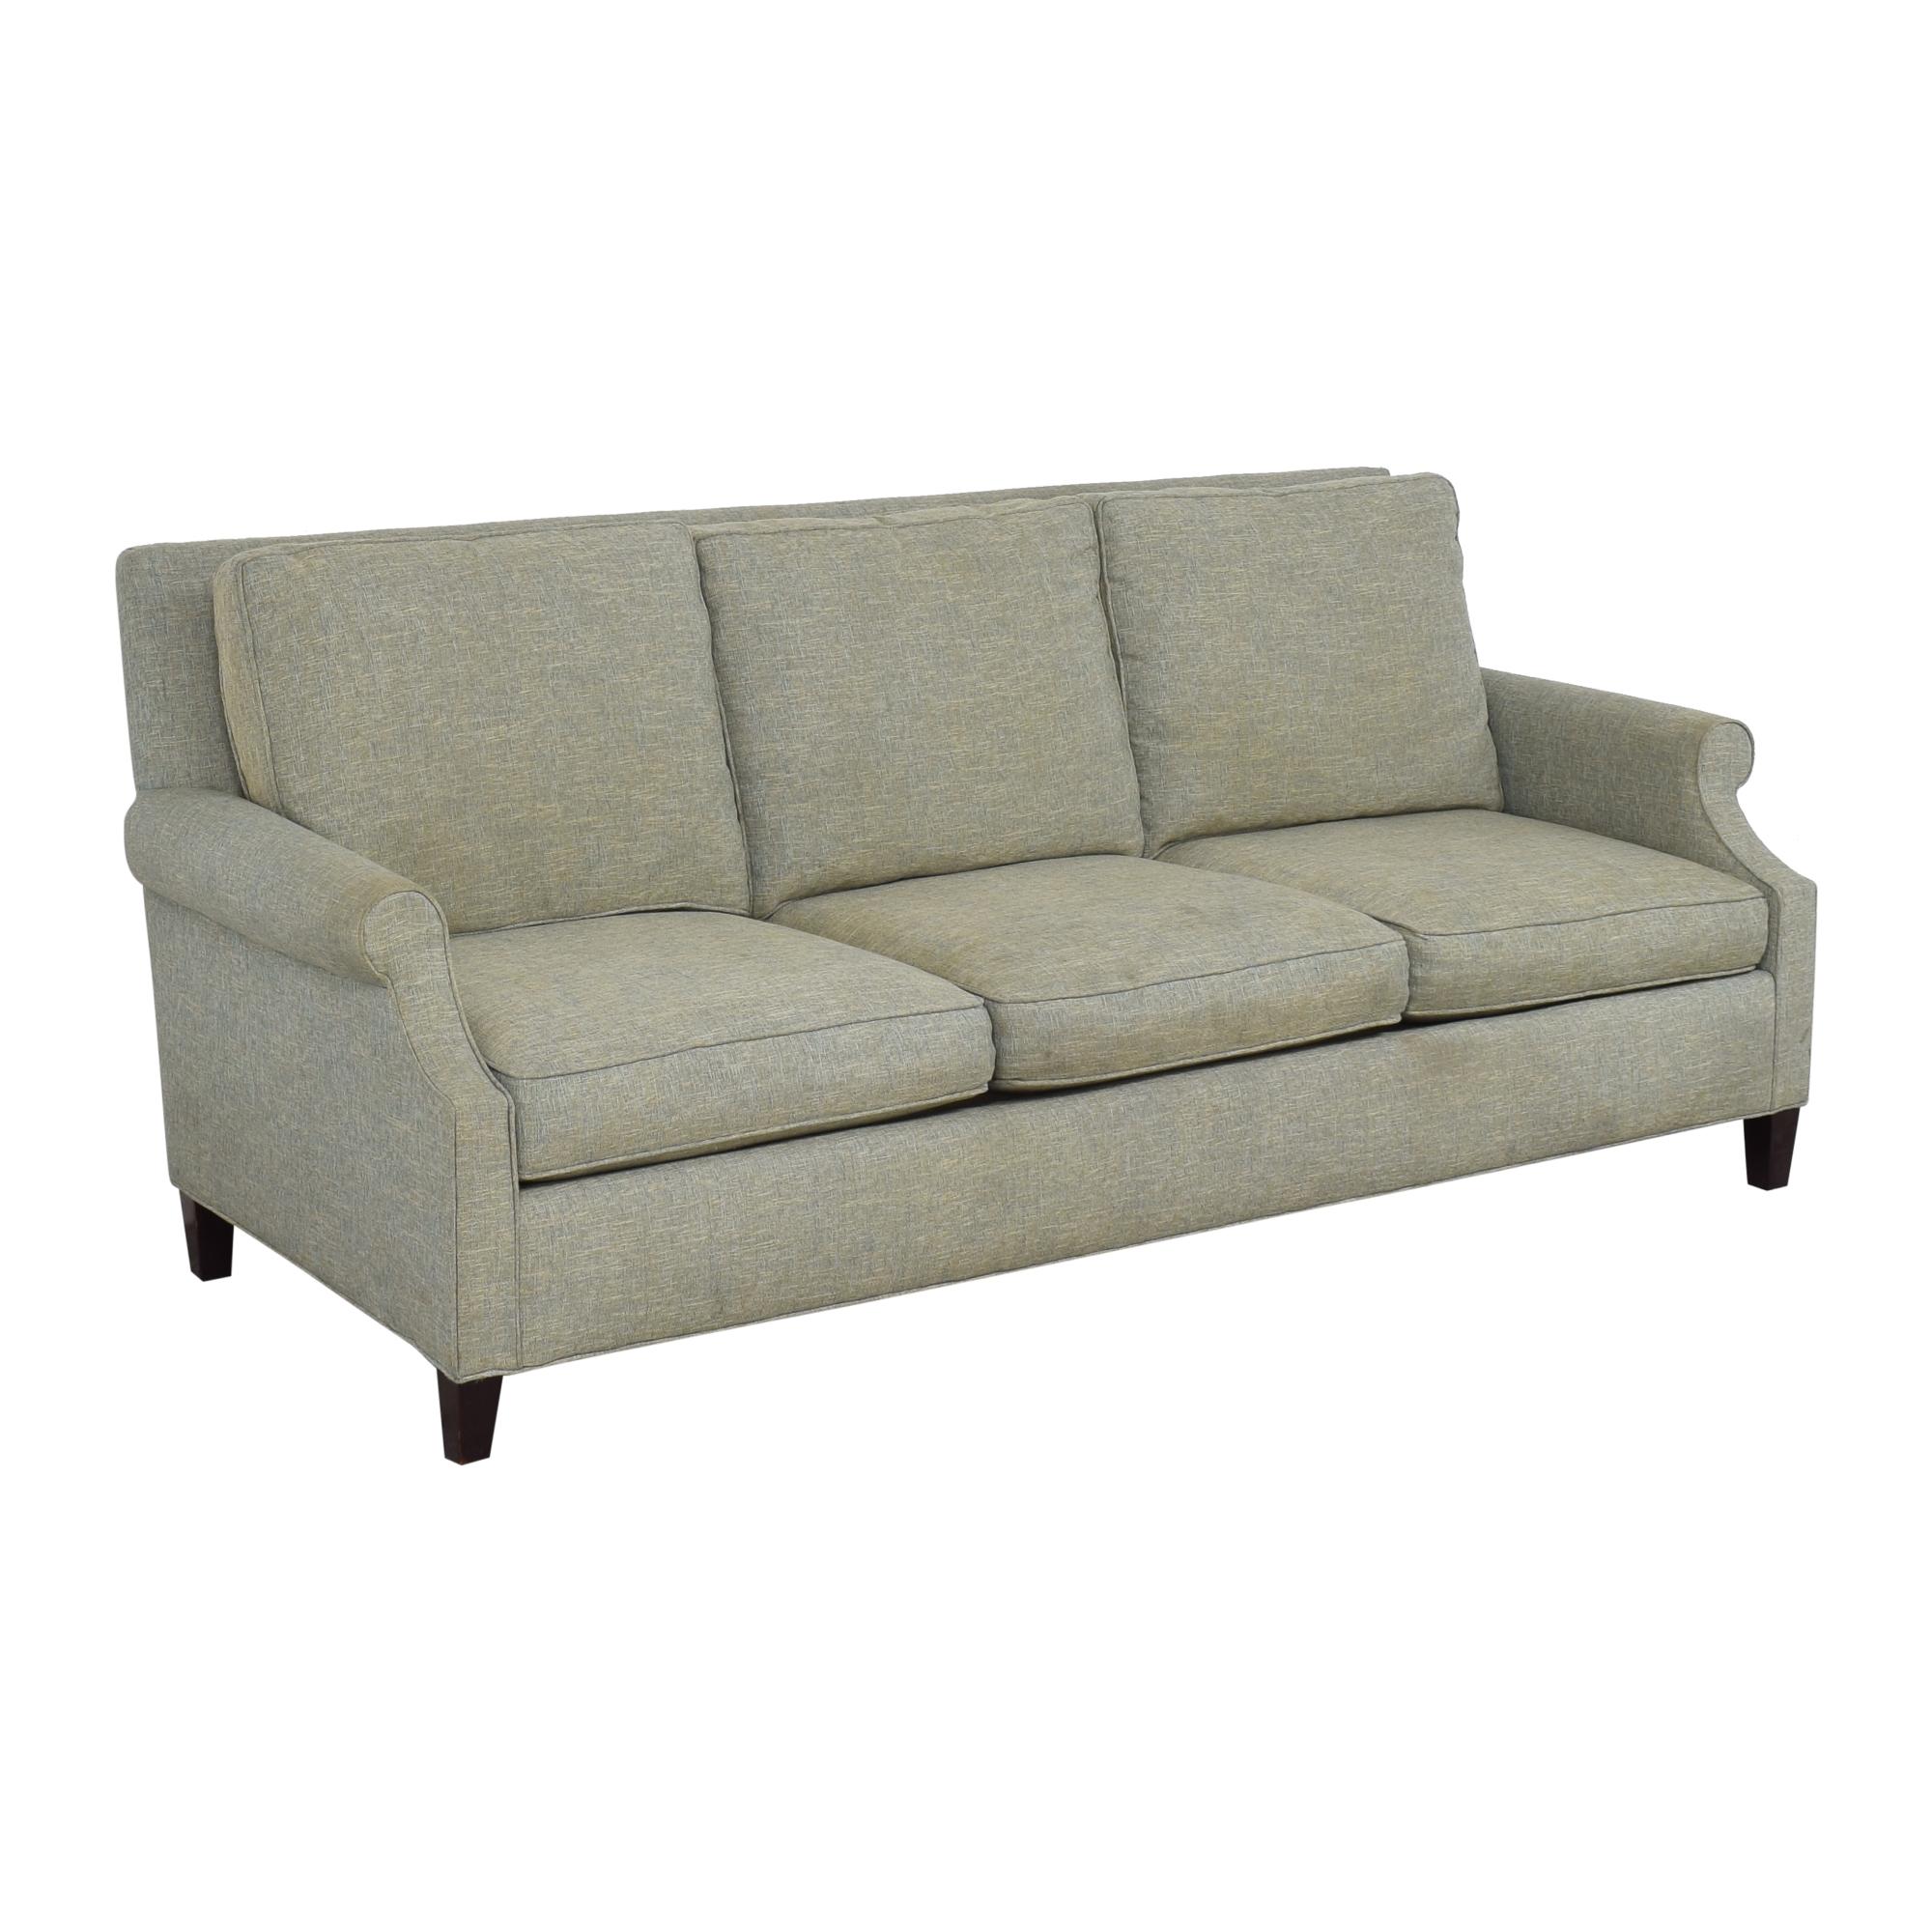 buy Stickley Furniture Natick Sofa Stickley Furniture Sofas